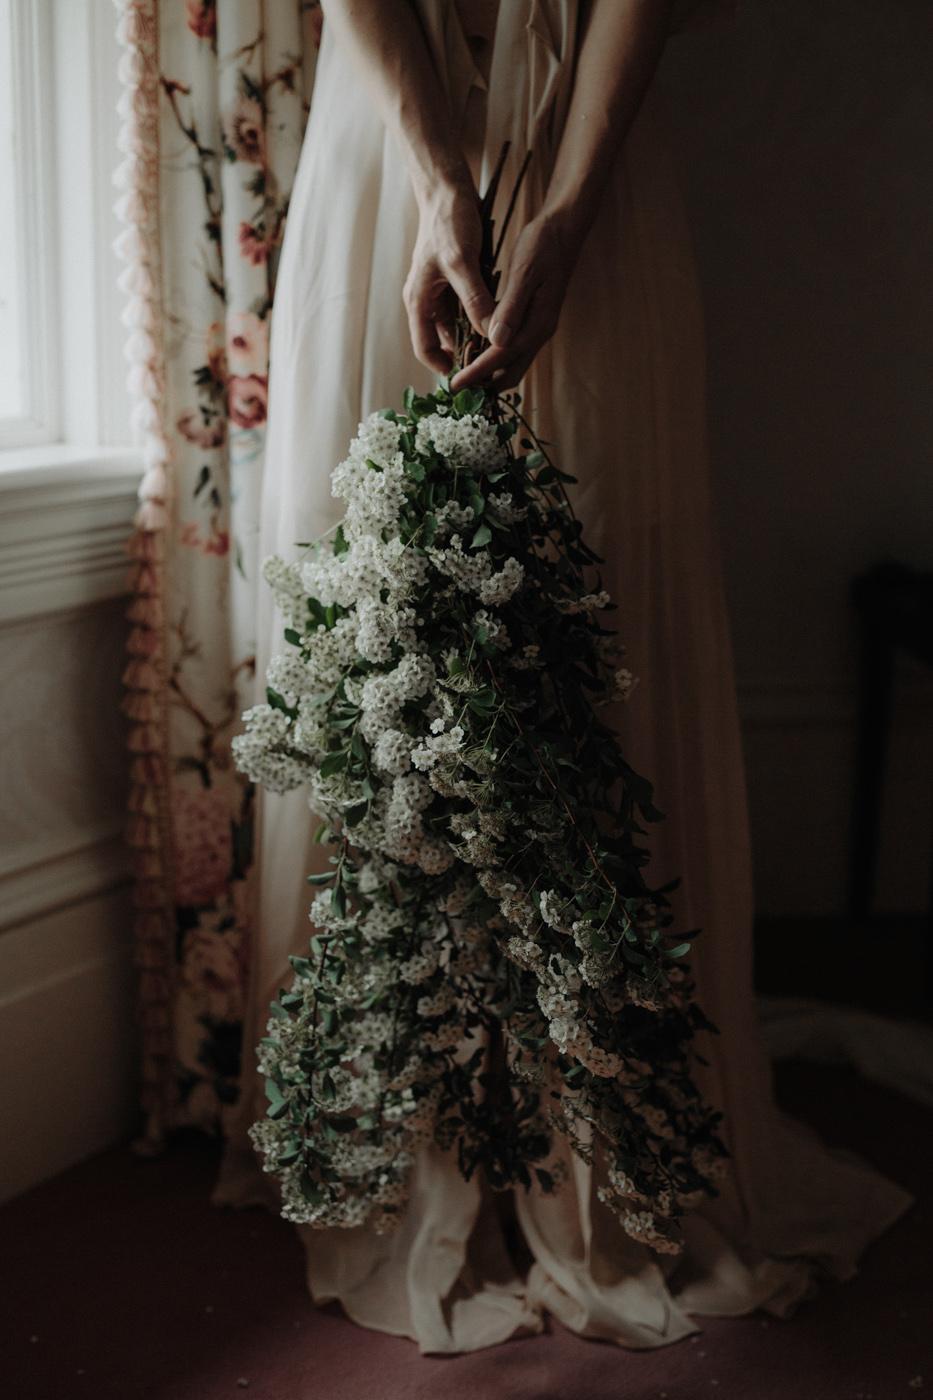 Erin-Mike-Intimate-Vintage-Wedding-Shelburne-Farms-Vermont -65.jpg